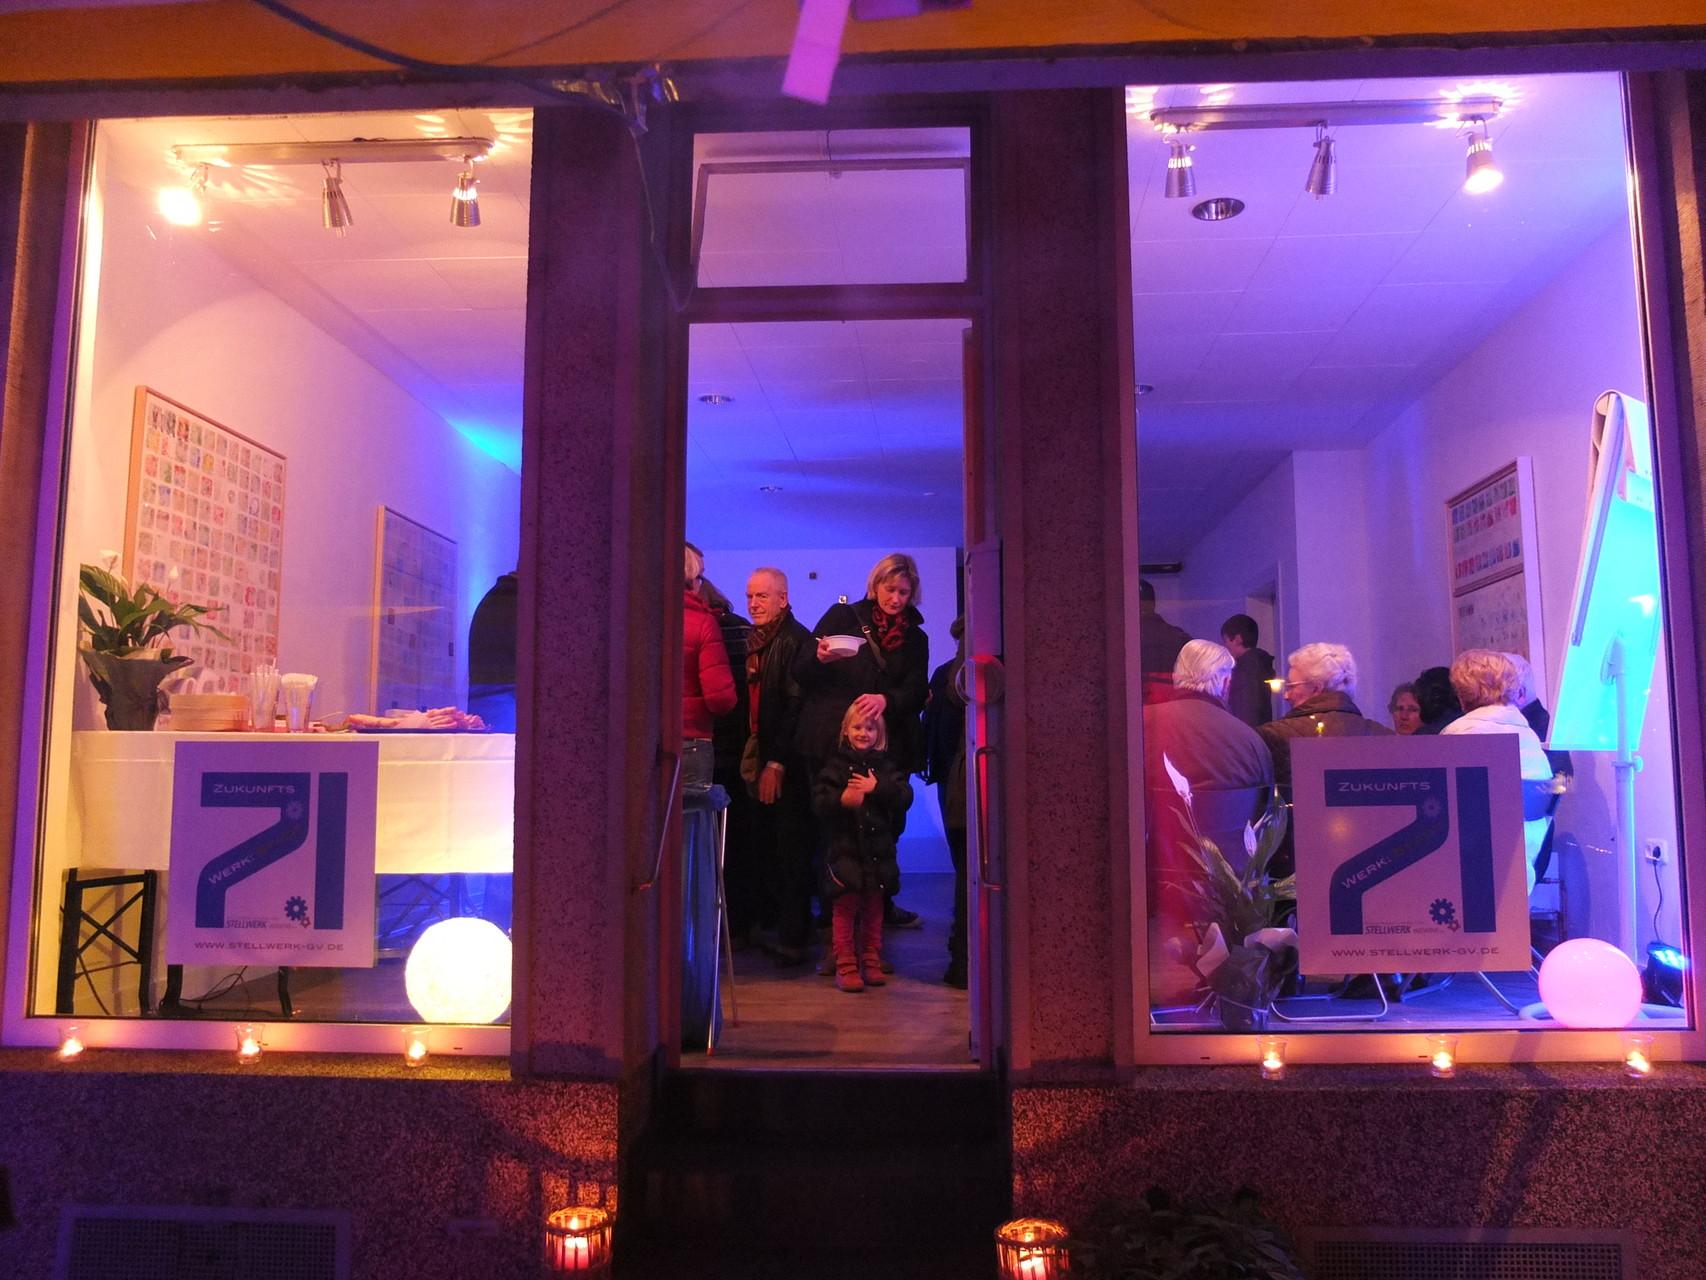 Das Bürgerbüro an der Bahnstraße 71 wurde im November 2014 eröffnet